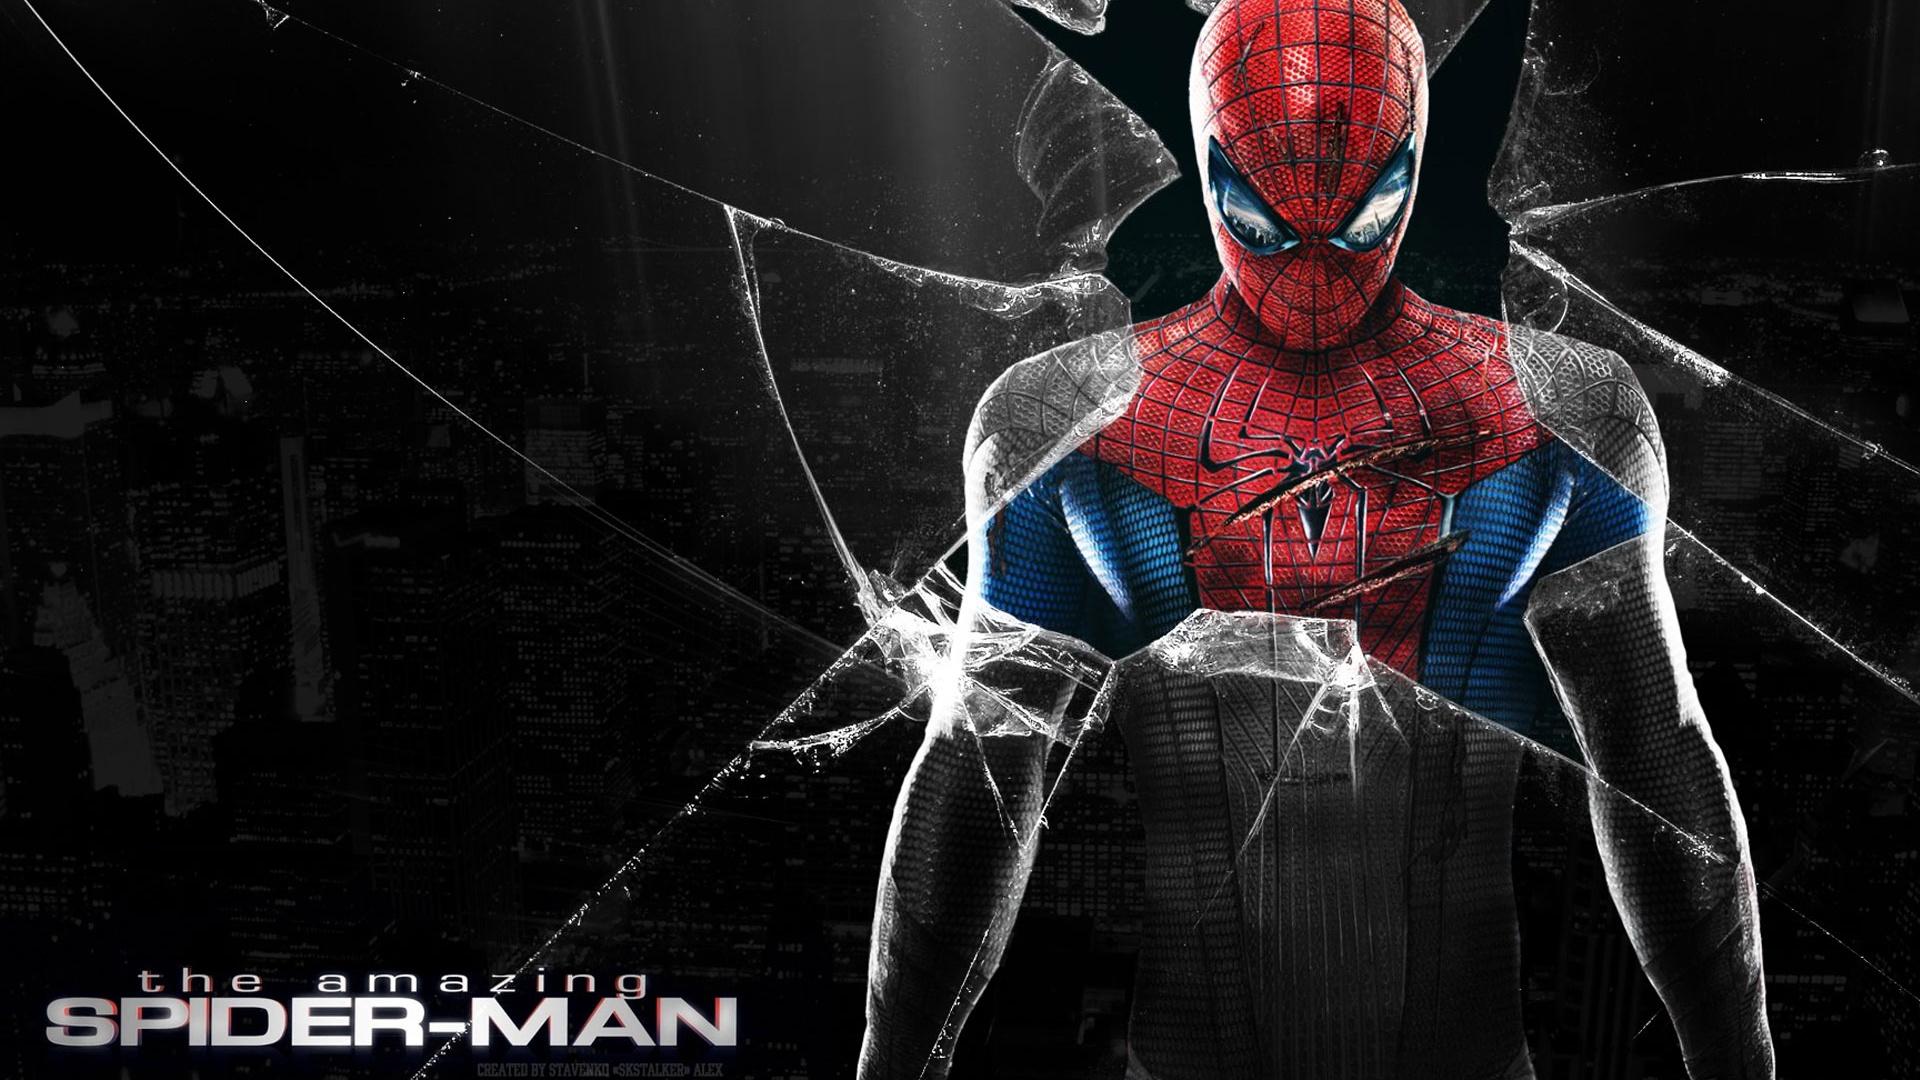 HD Spider Man Desktop Wallpapers, High Quality Spider Man